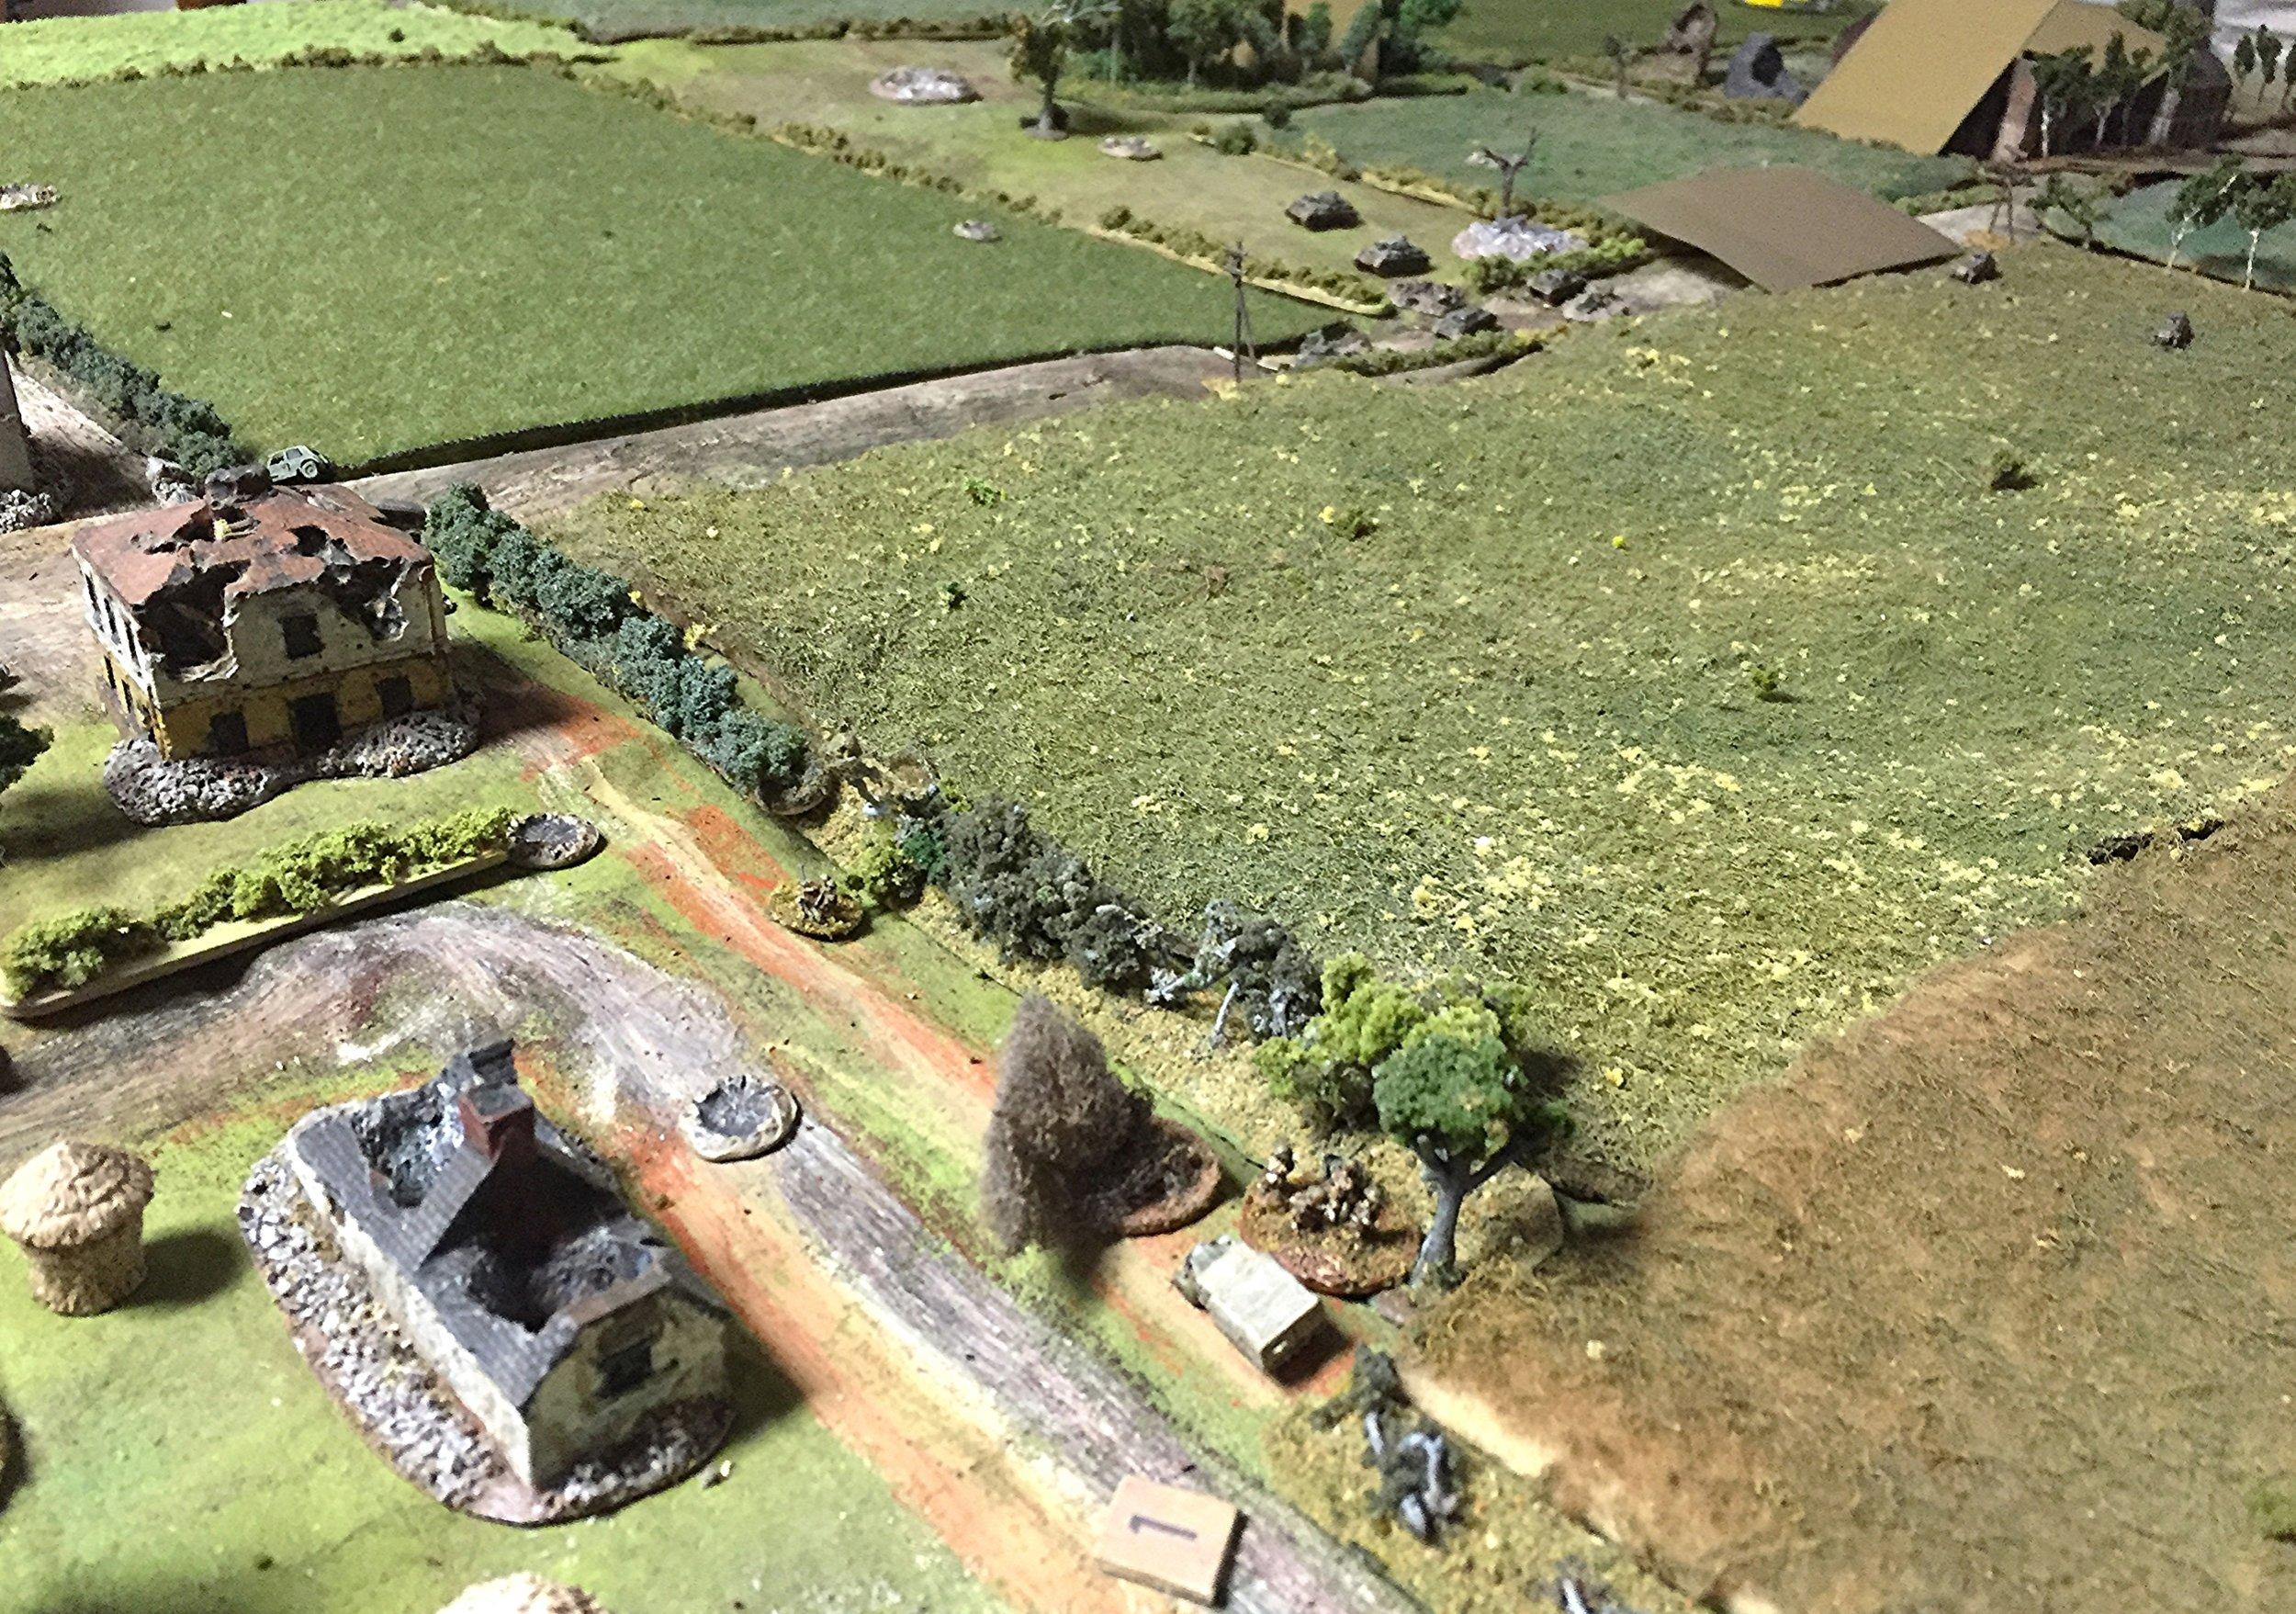 British Defences Open Fire